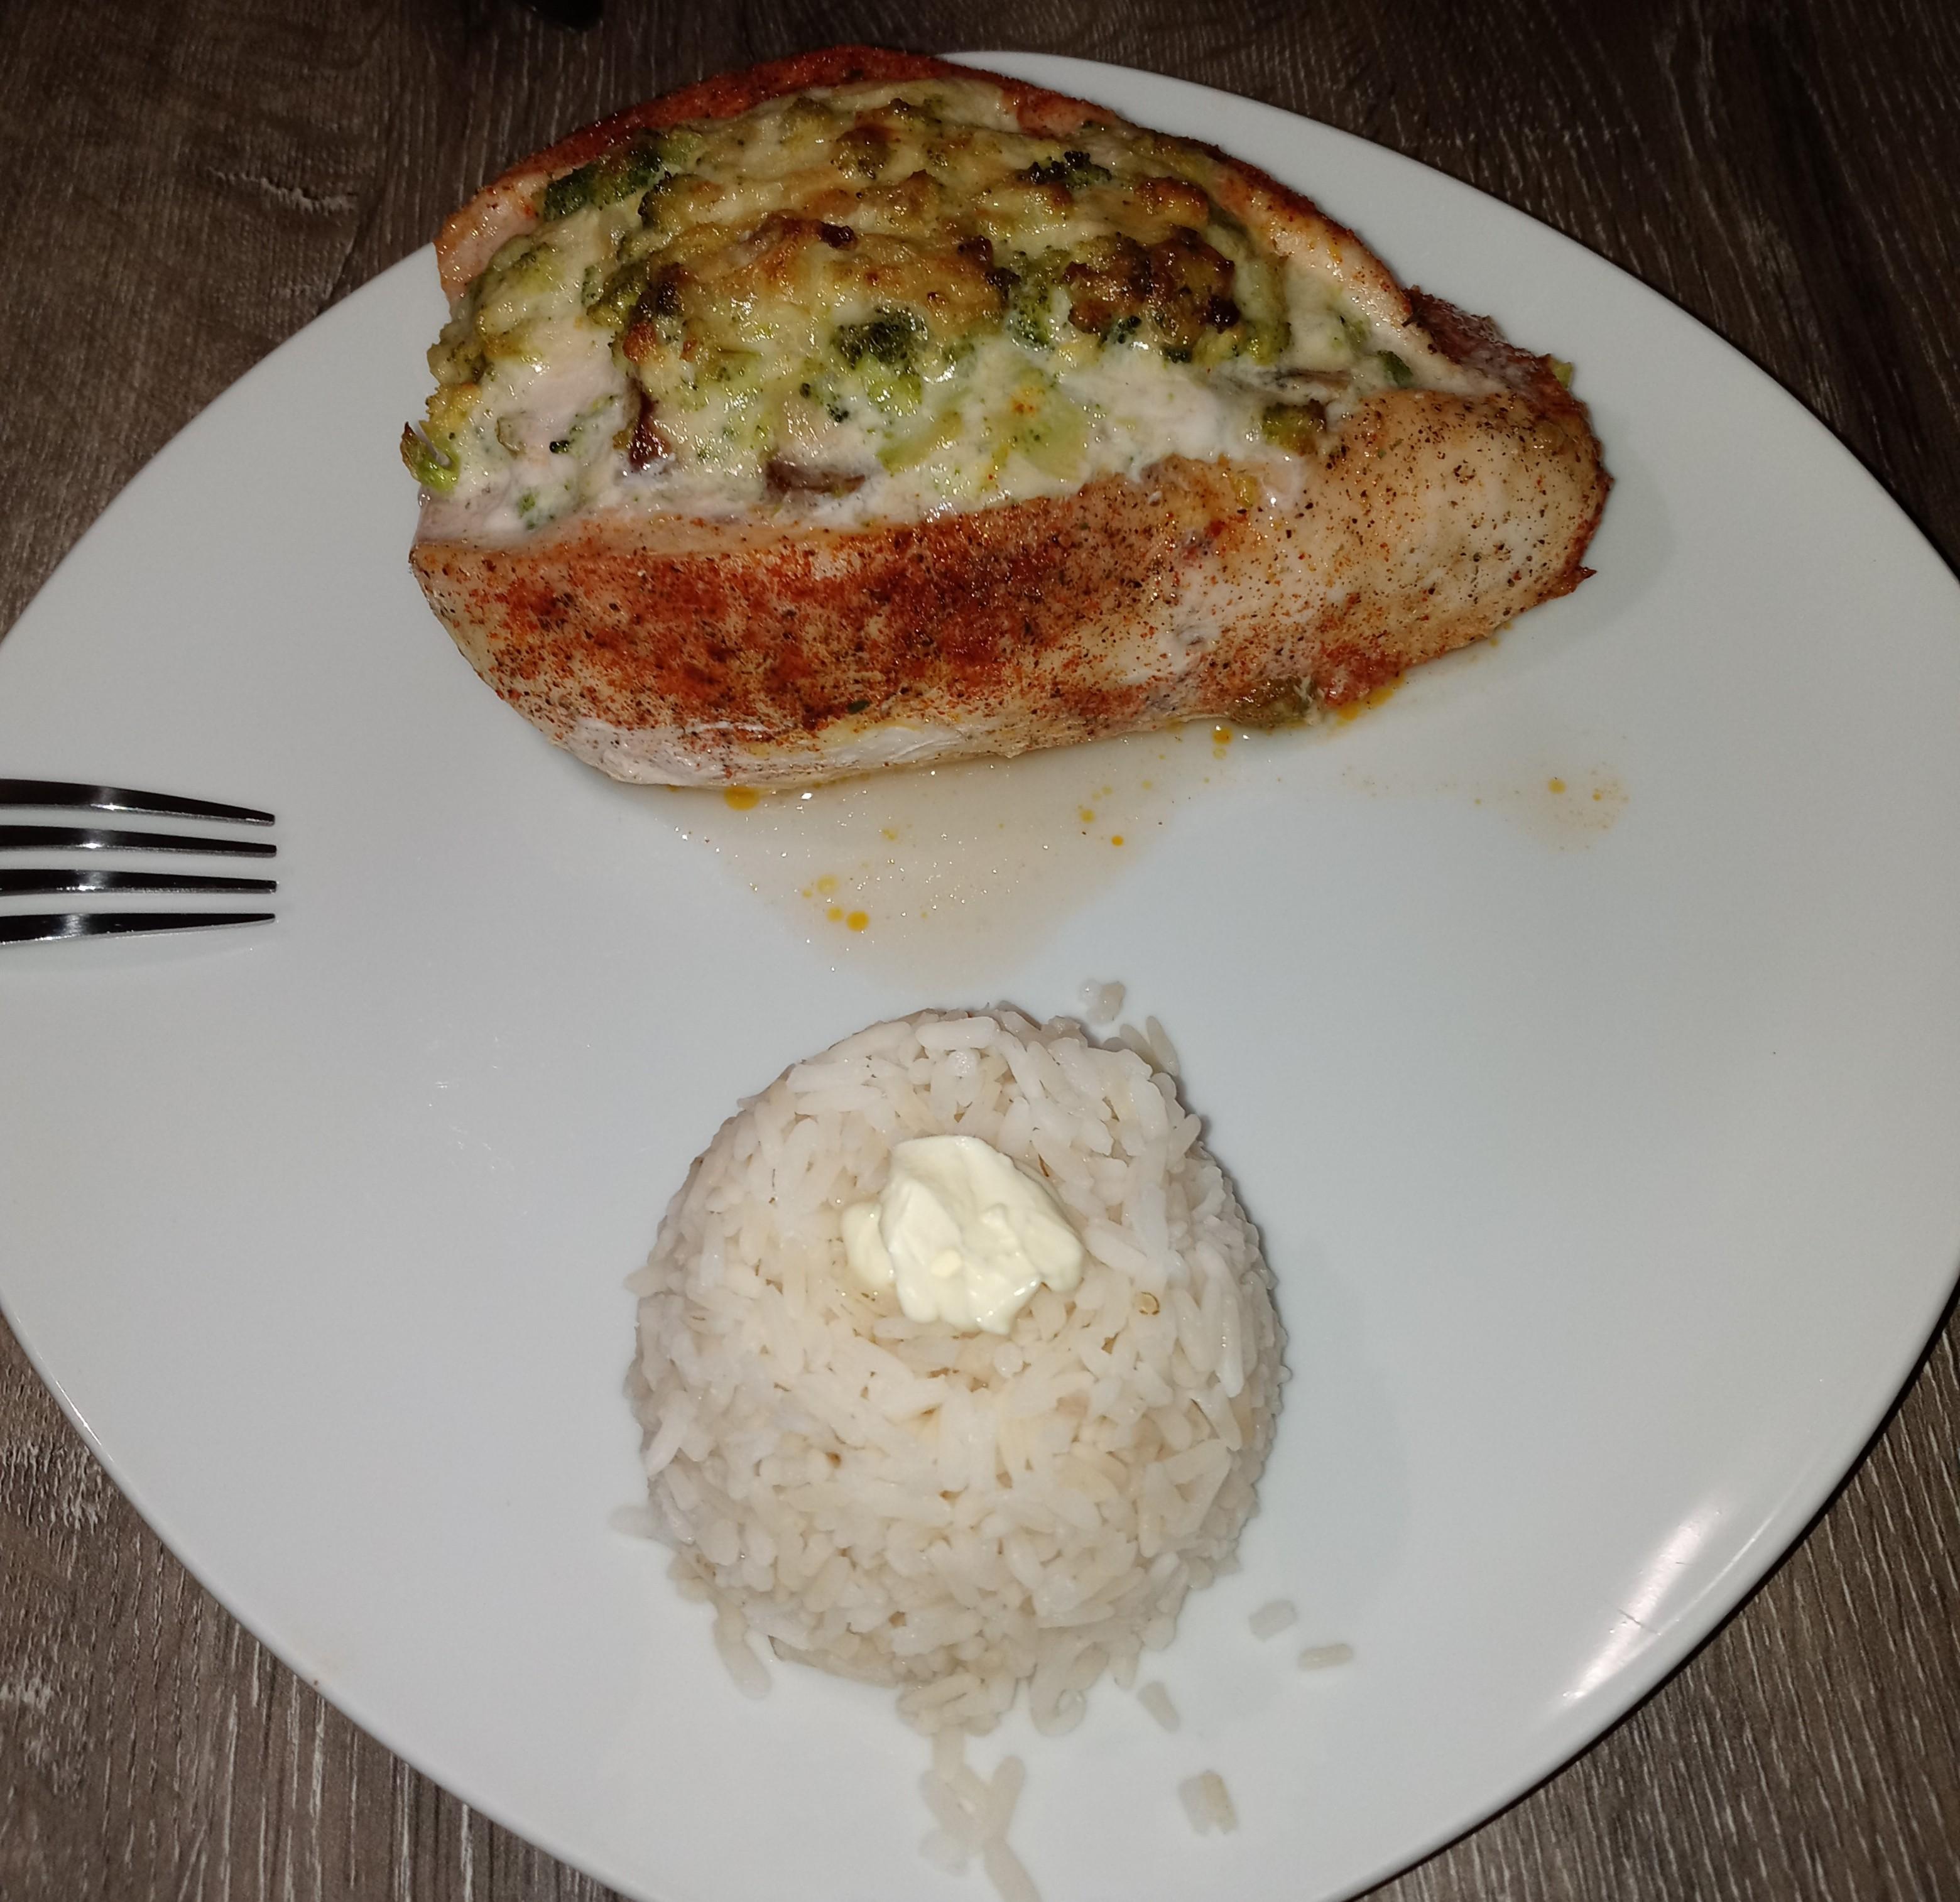 Mushroom, Broccoli, and Cheese Stuffed Chicken Will B